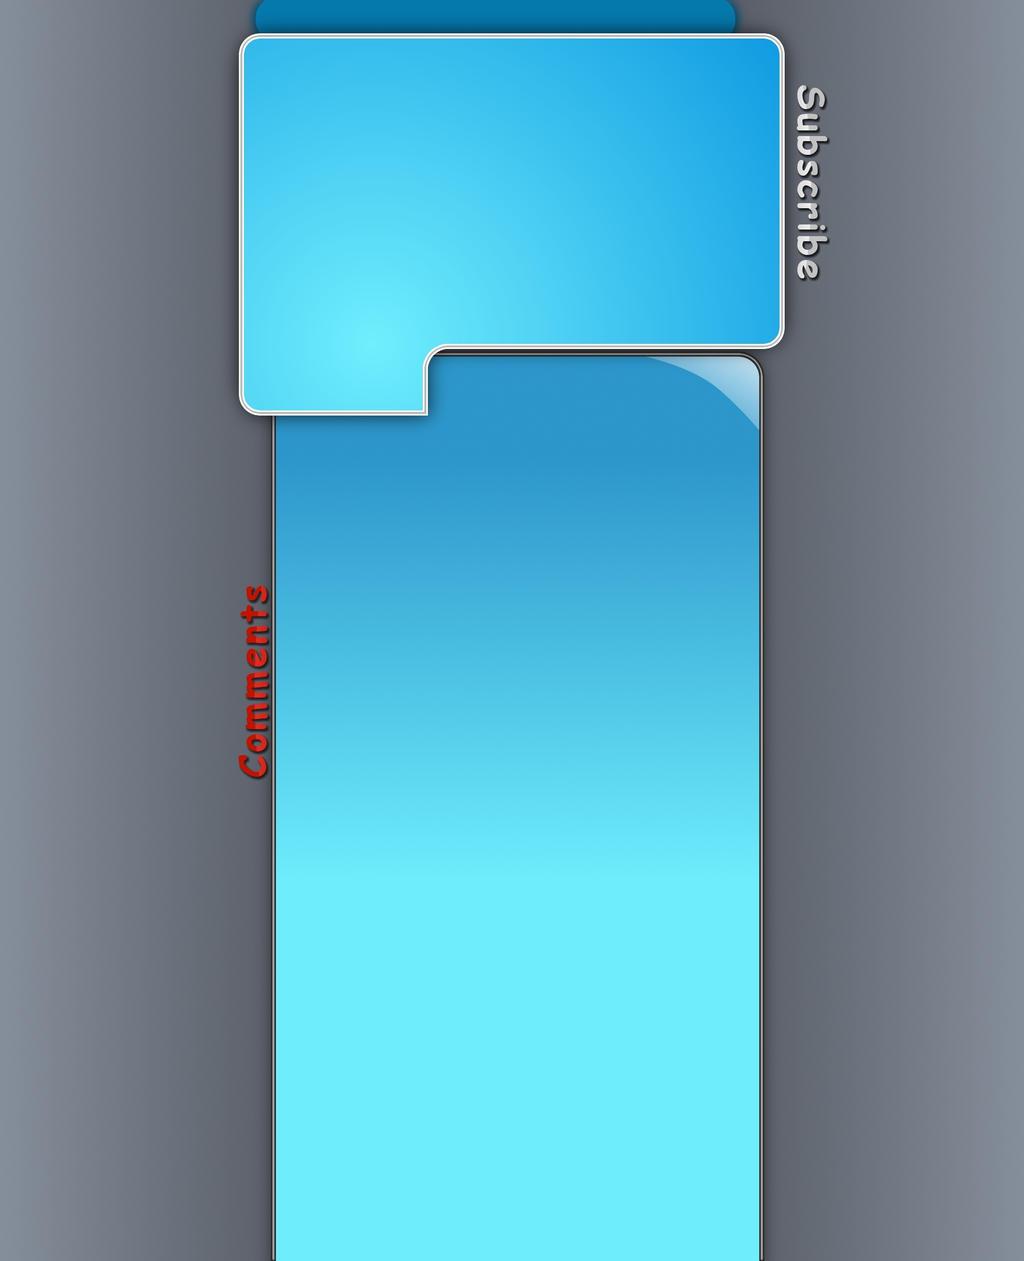 Free Blue Youtube Design by JonasForTheArt